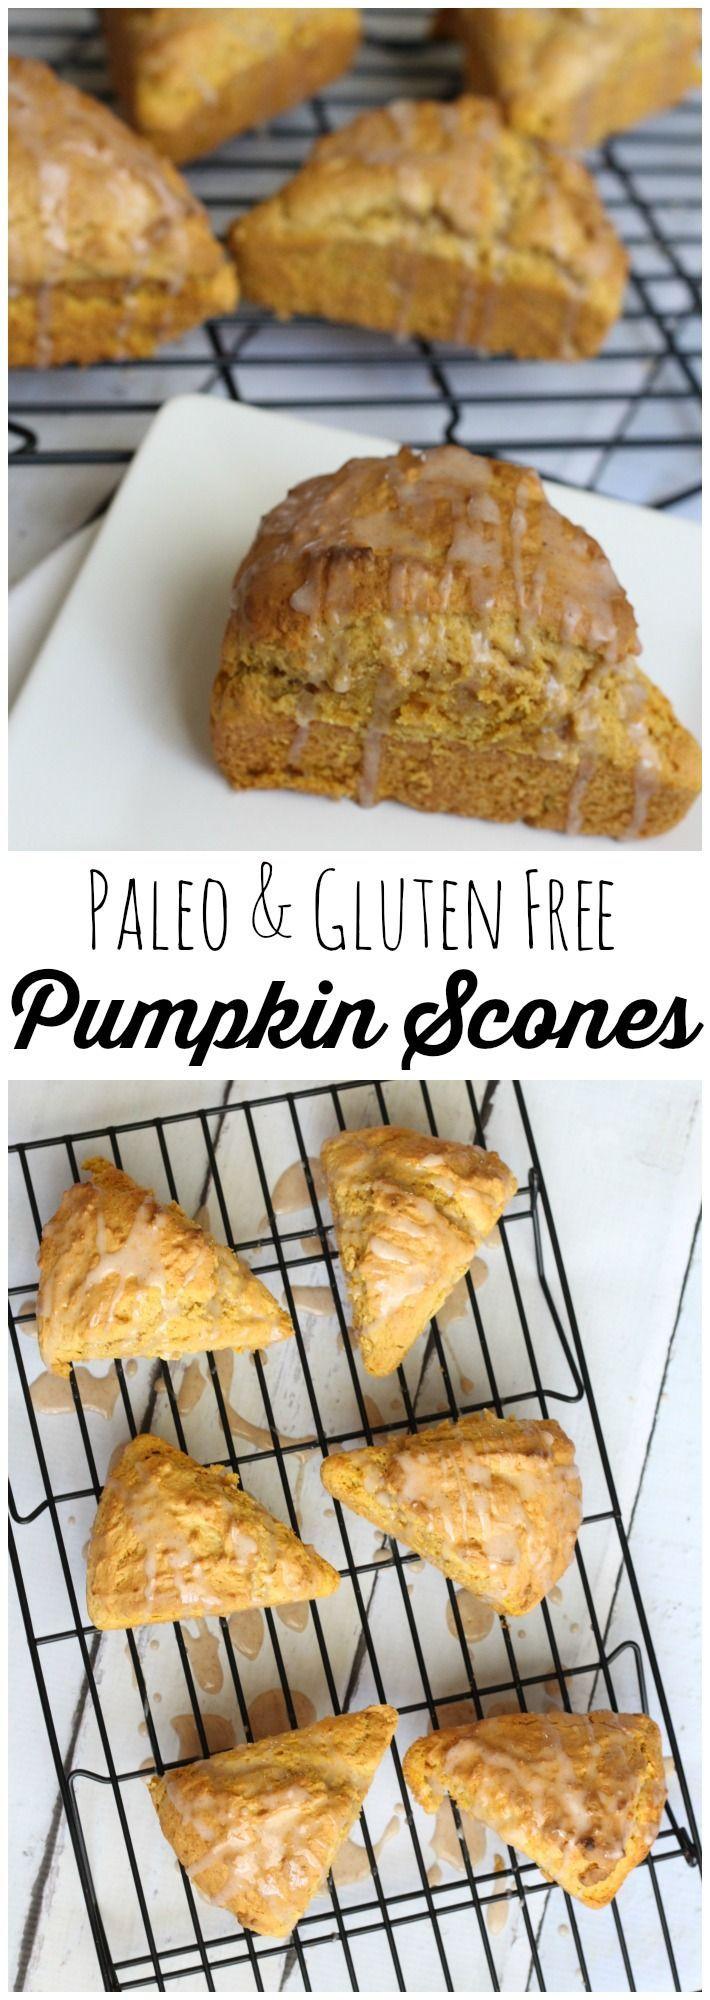 Paleo grain free pumpkin scone recipe with original and gluten free recipes.